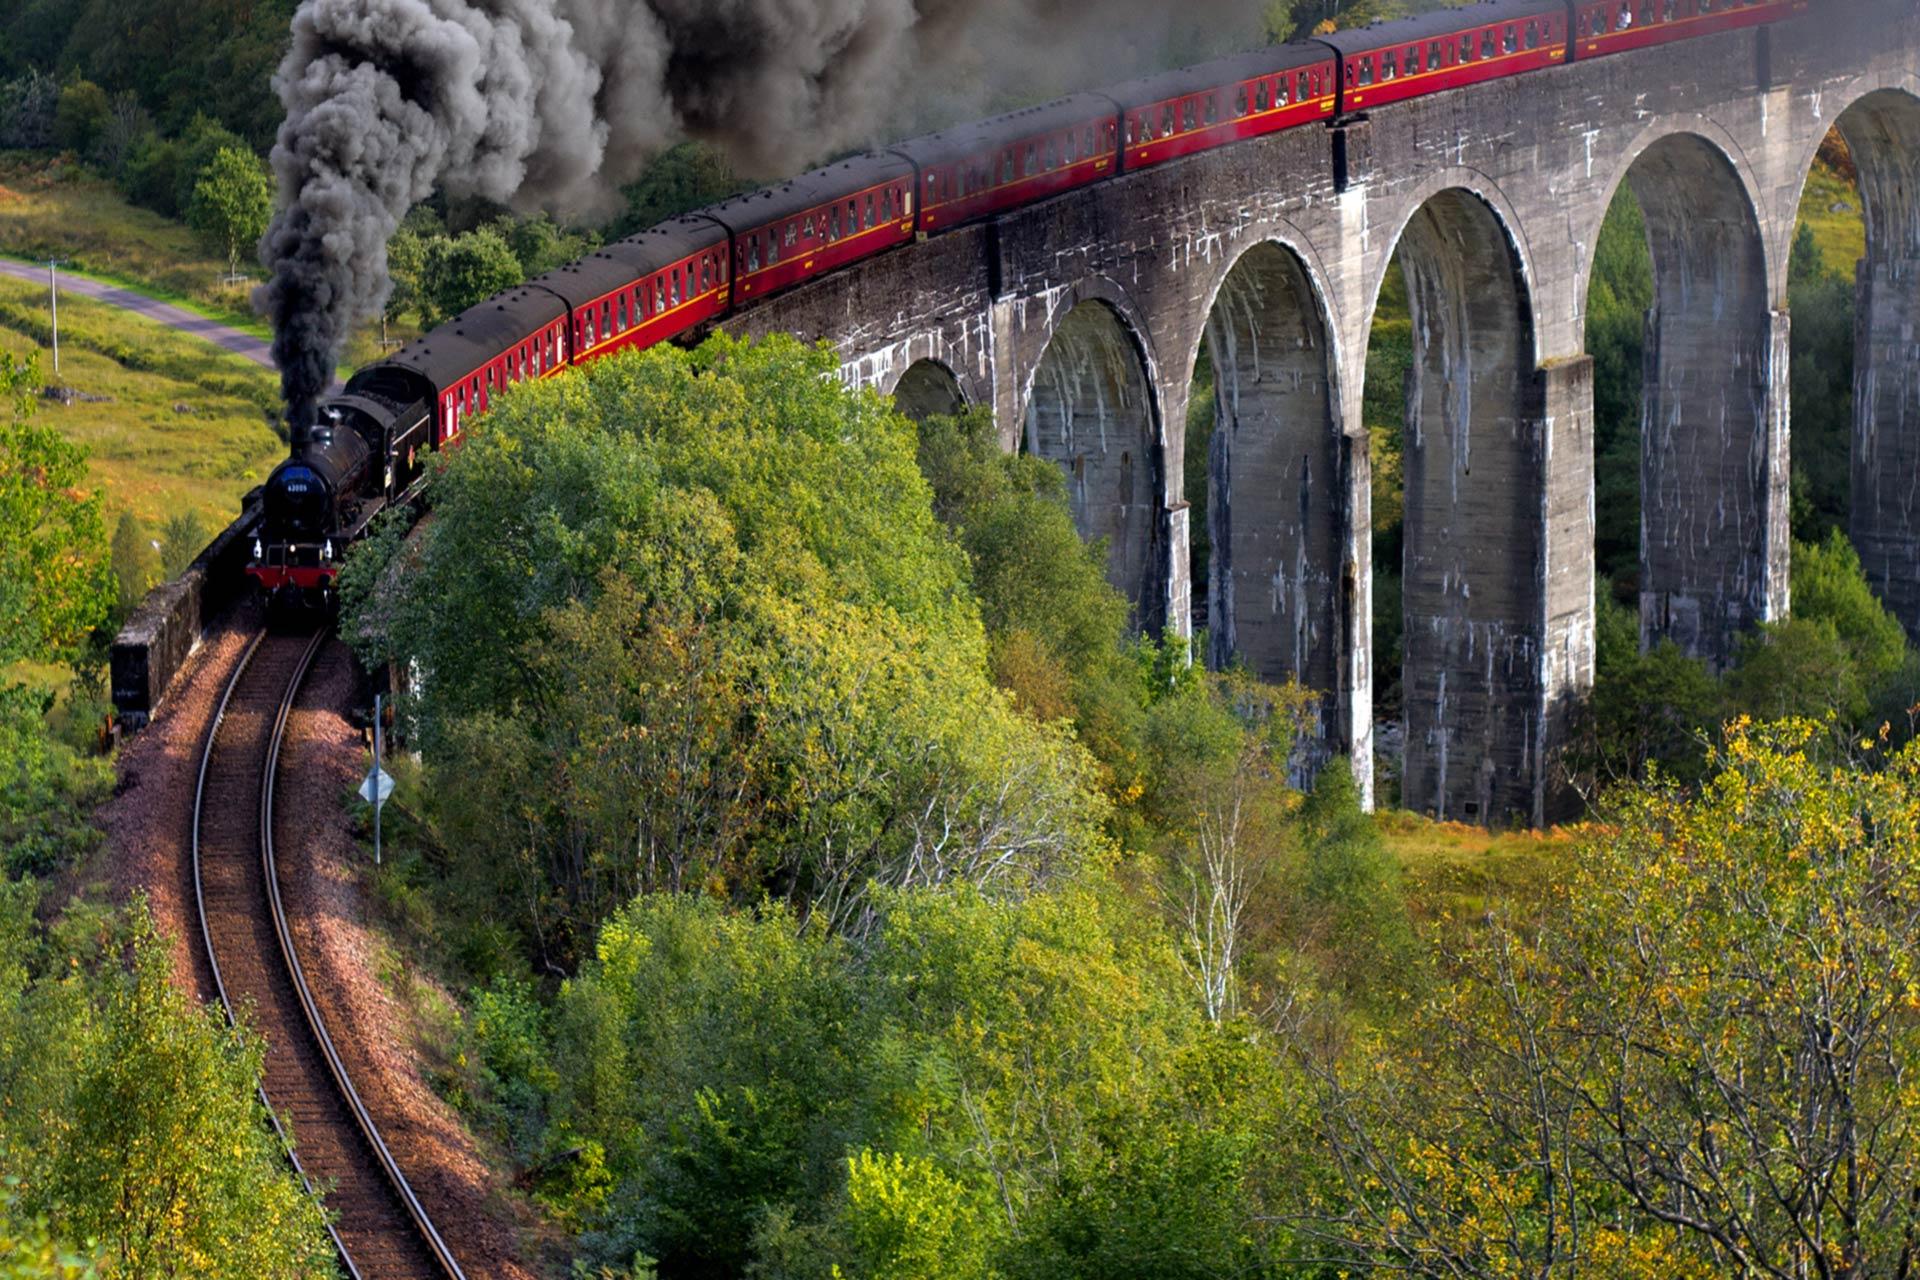 Train Holidays Amp Railways Tours In Scotland Visitscotland